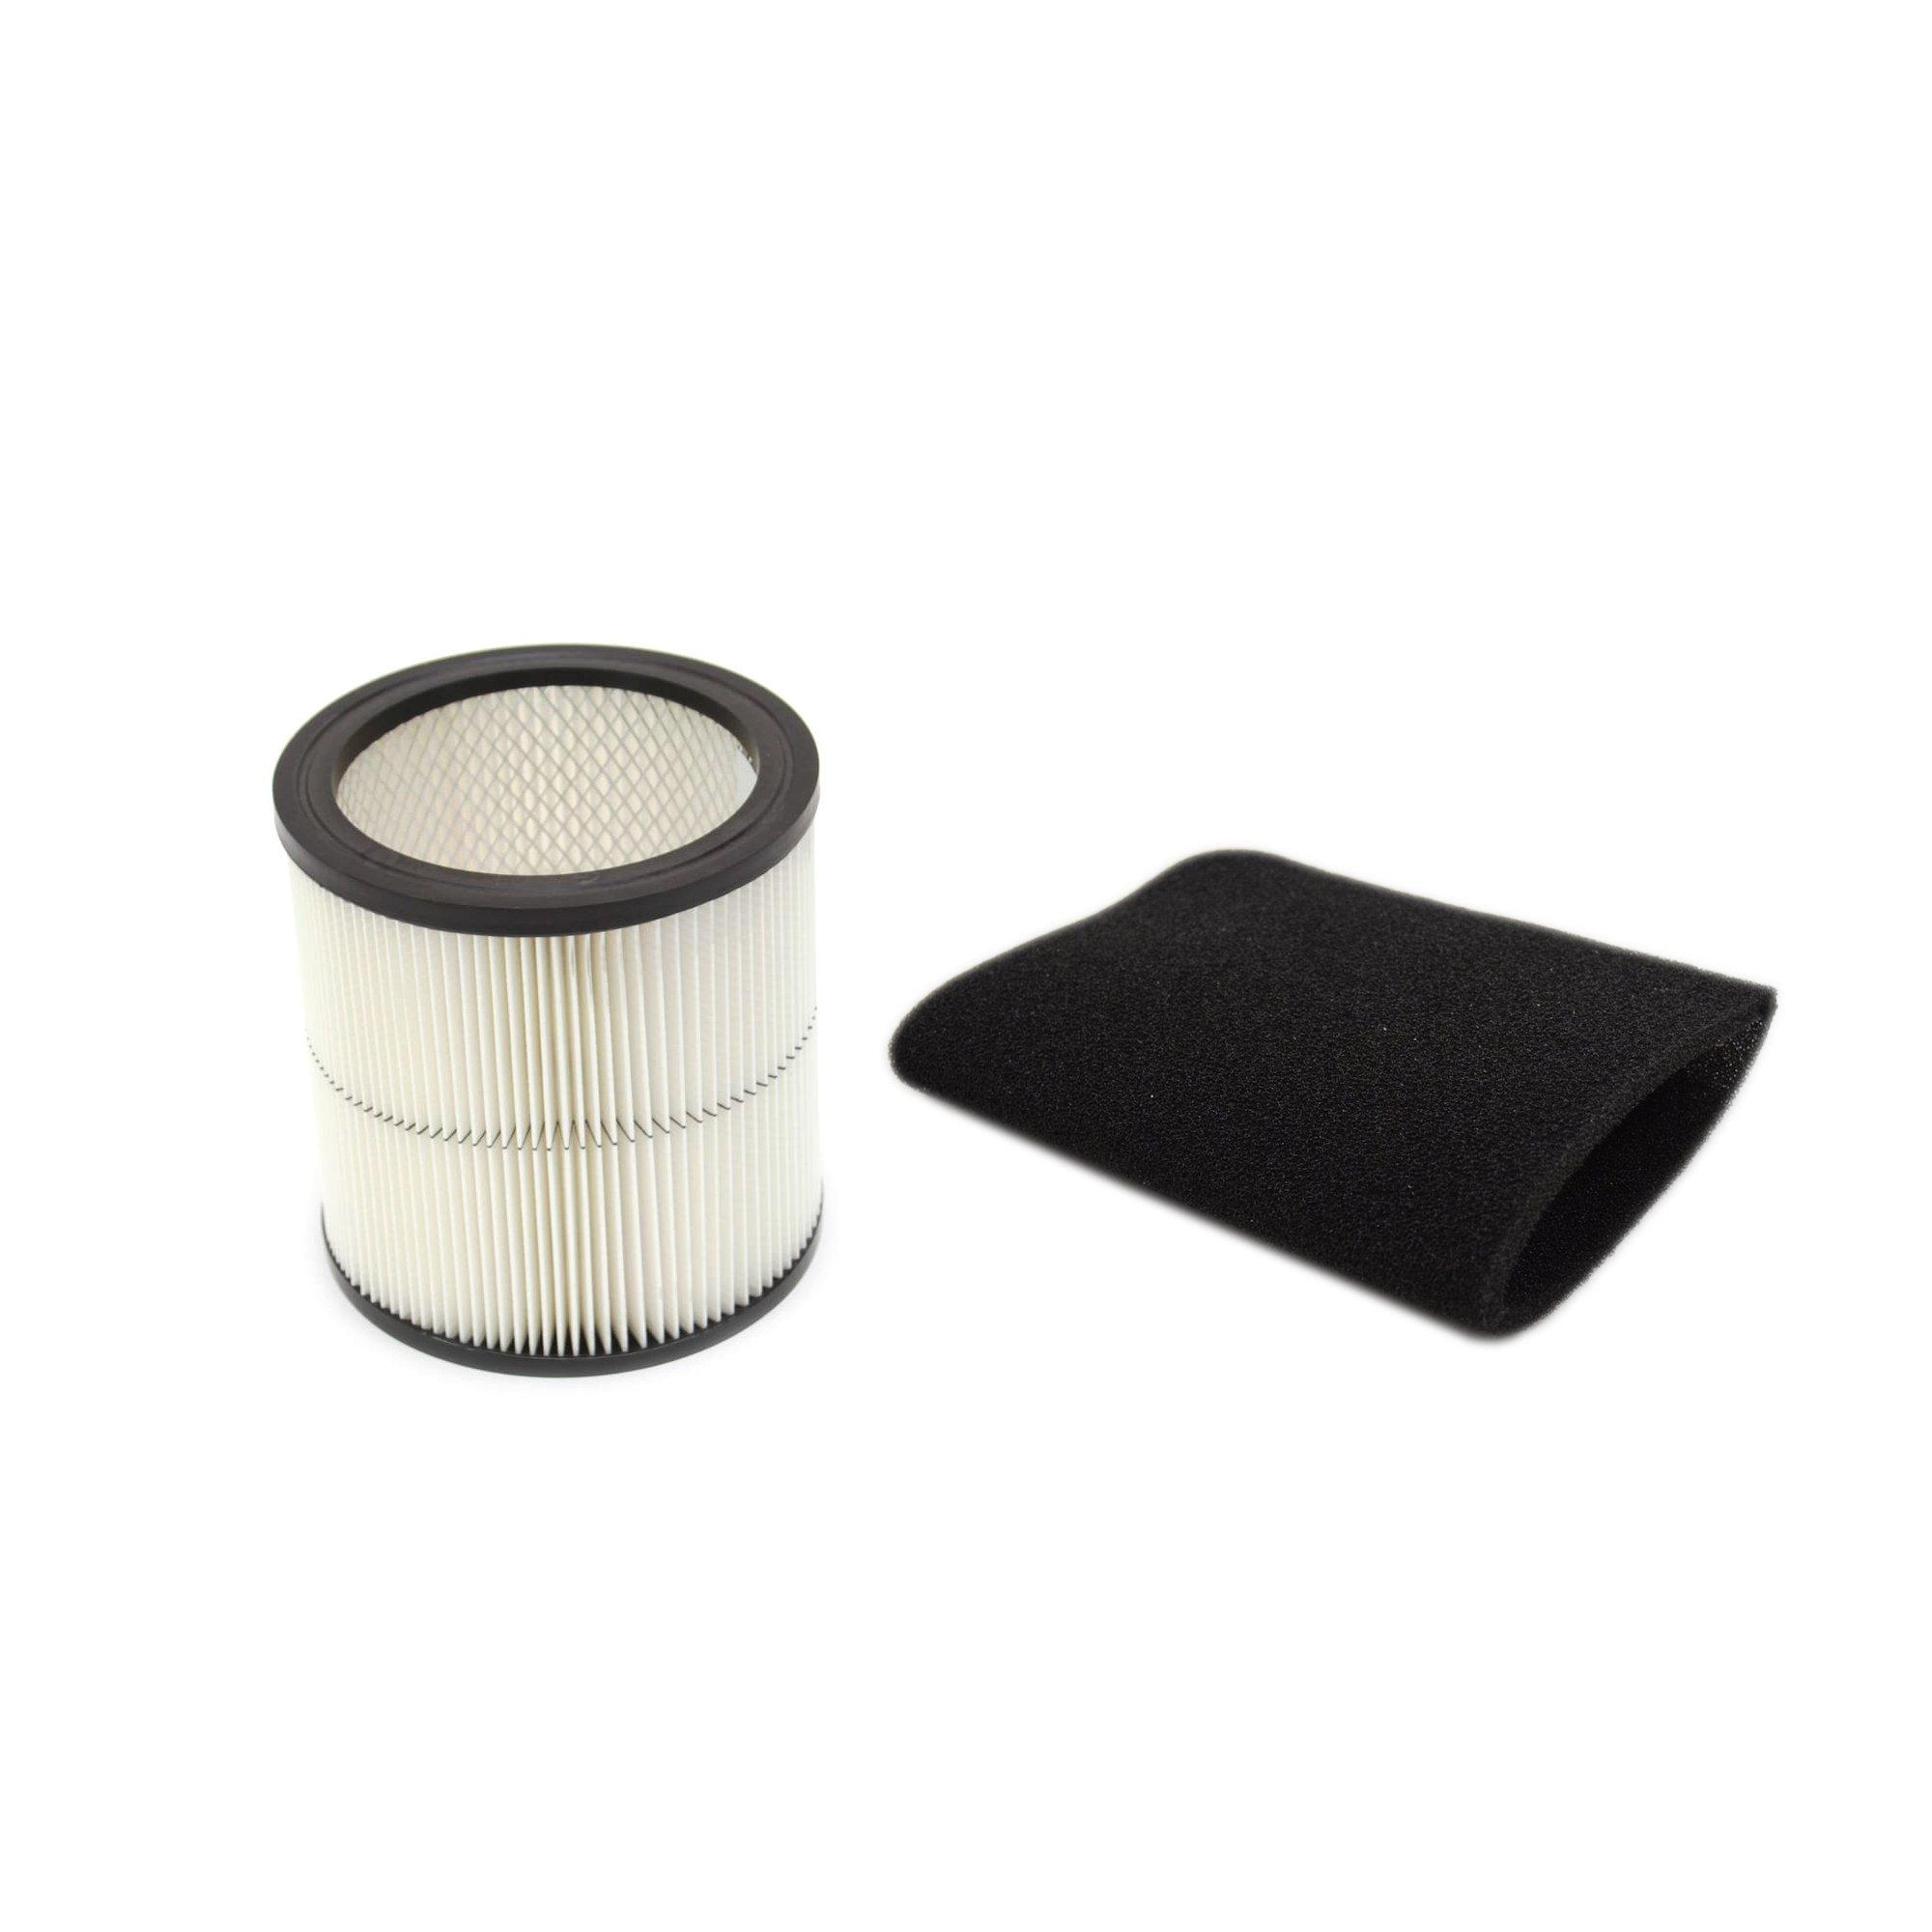 Craftsman 17884 Shop Vacuum Filter and Shop Vacuum 17888 Foam Filter Sleeve Bundle by Craftsman